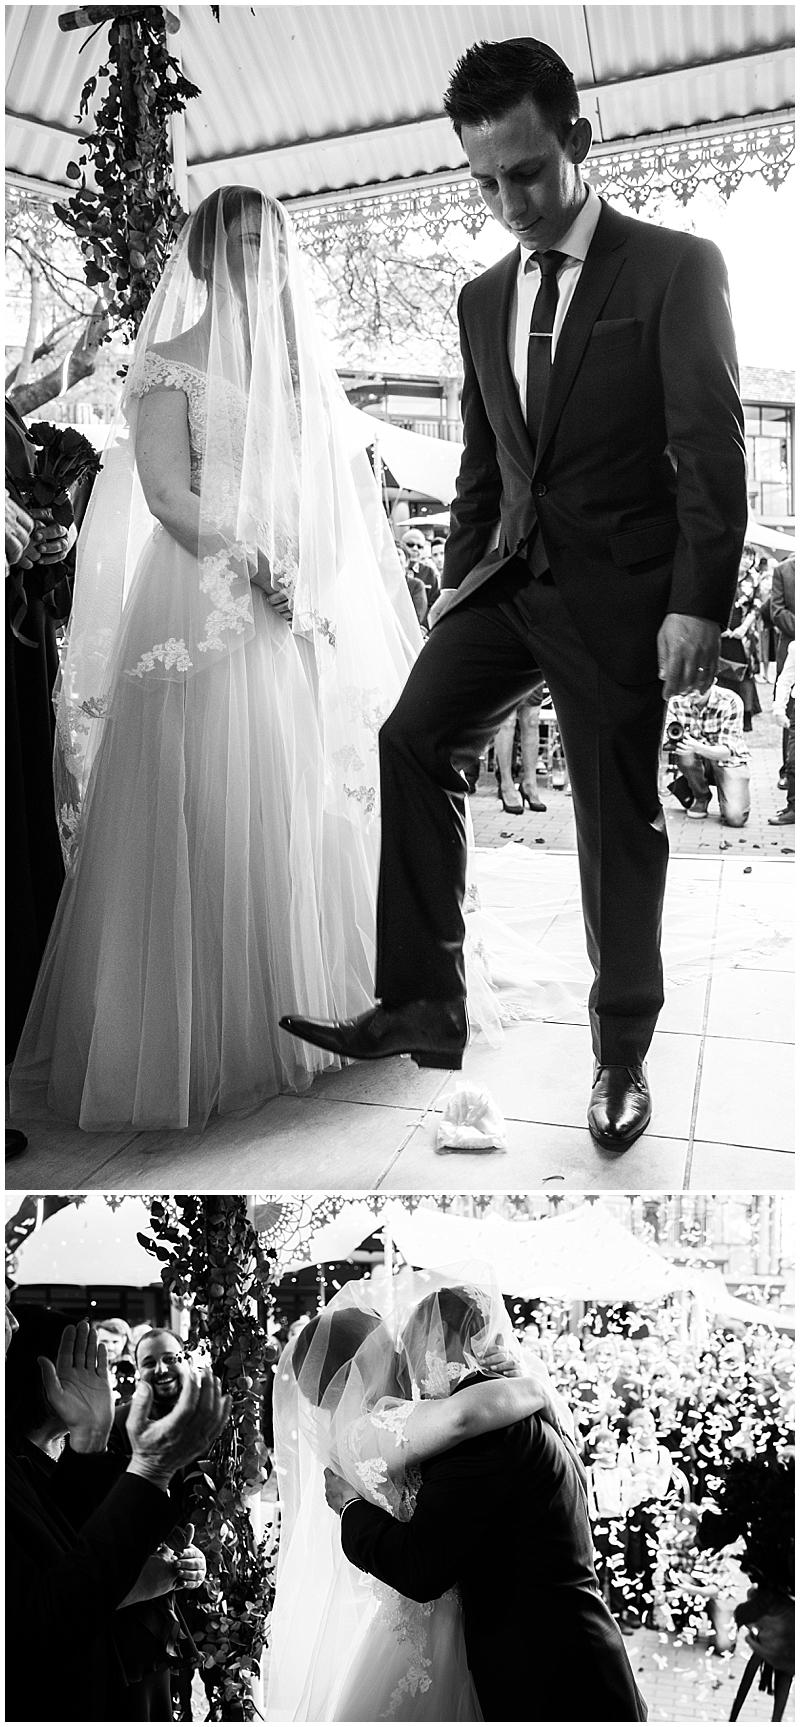 AlexanderSmith-651_AlexanderSmith Best Wedding Photographer-1.jpg